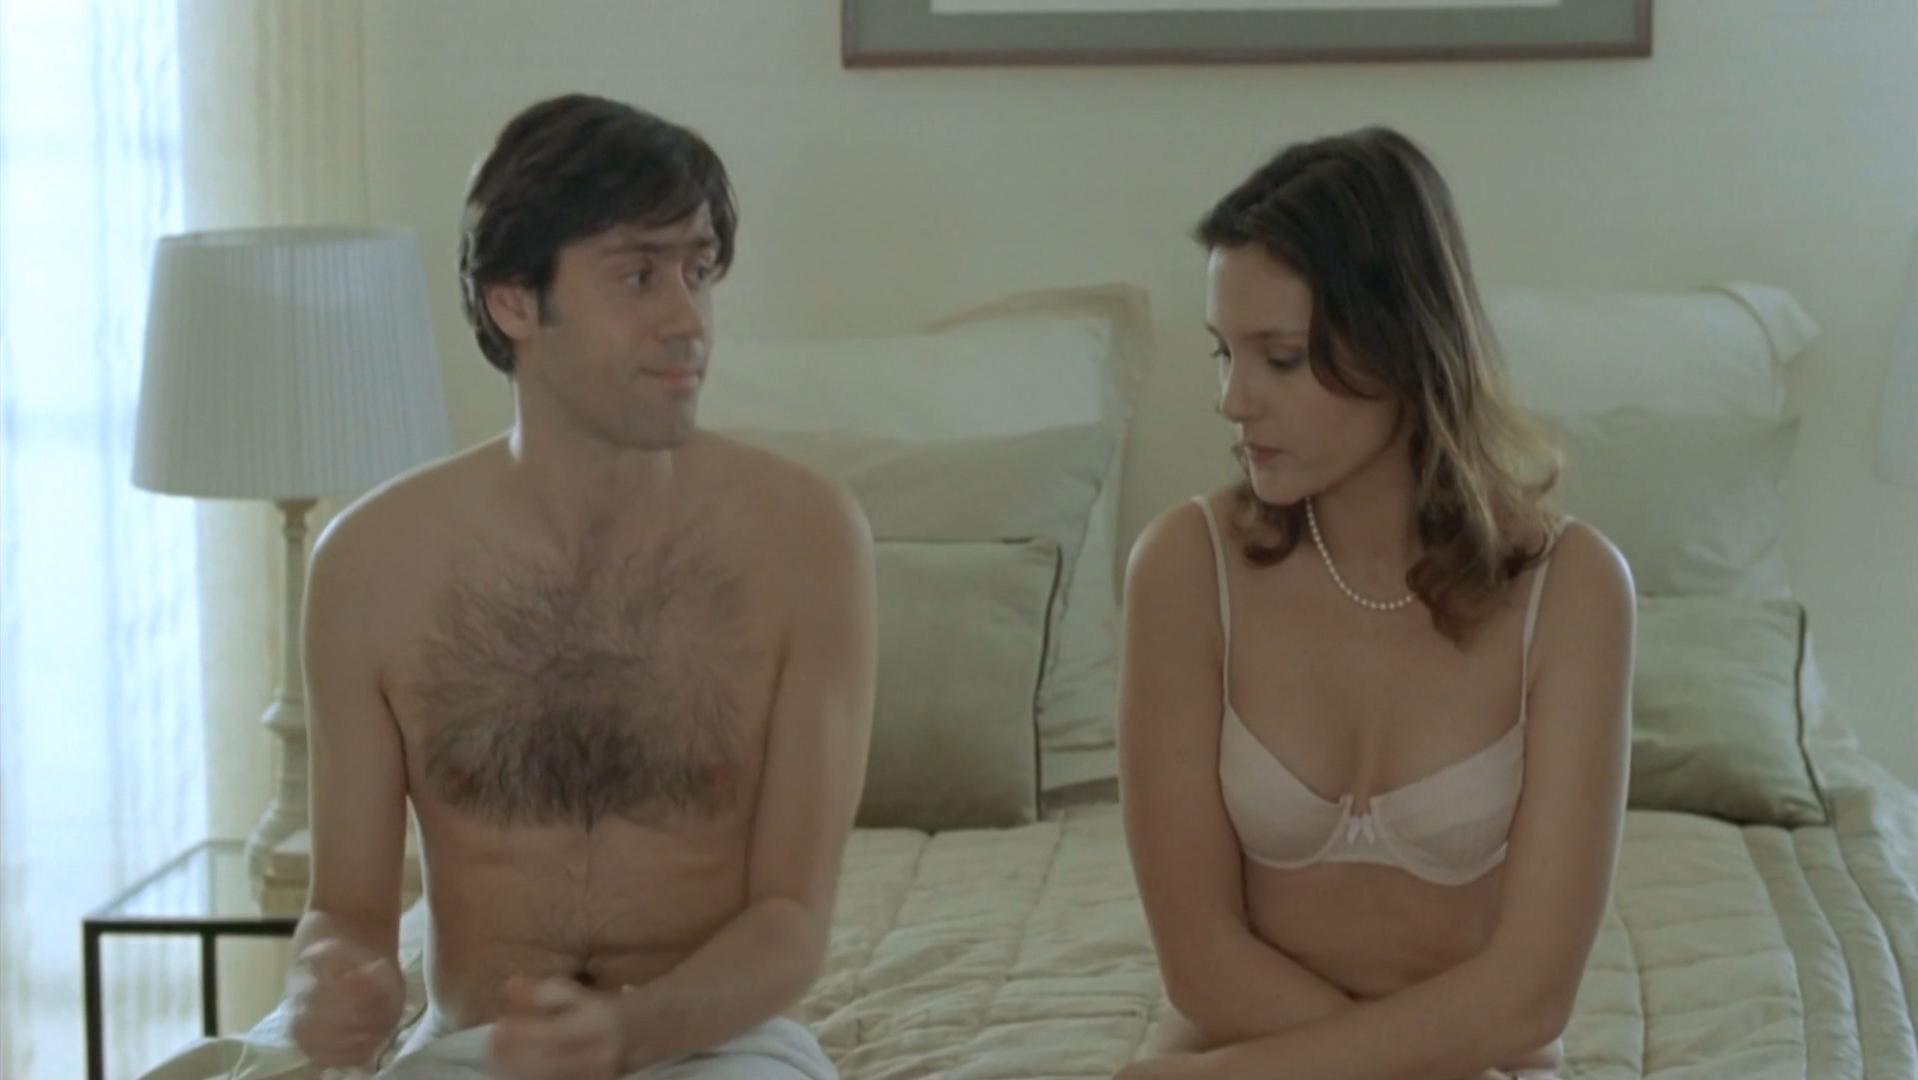 Virginie Ledoyen nude - Shall We Kiss (2007)